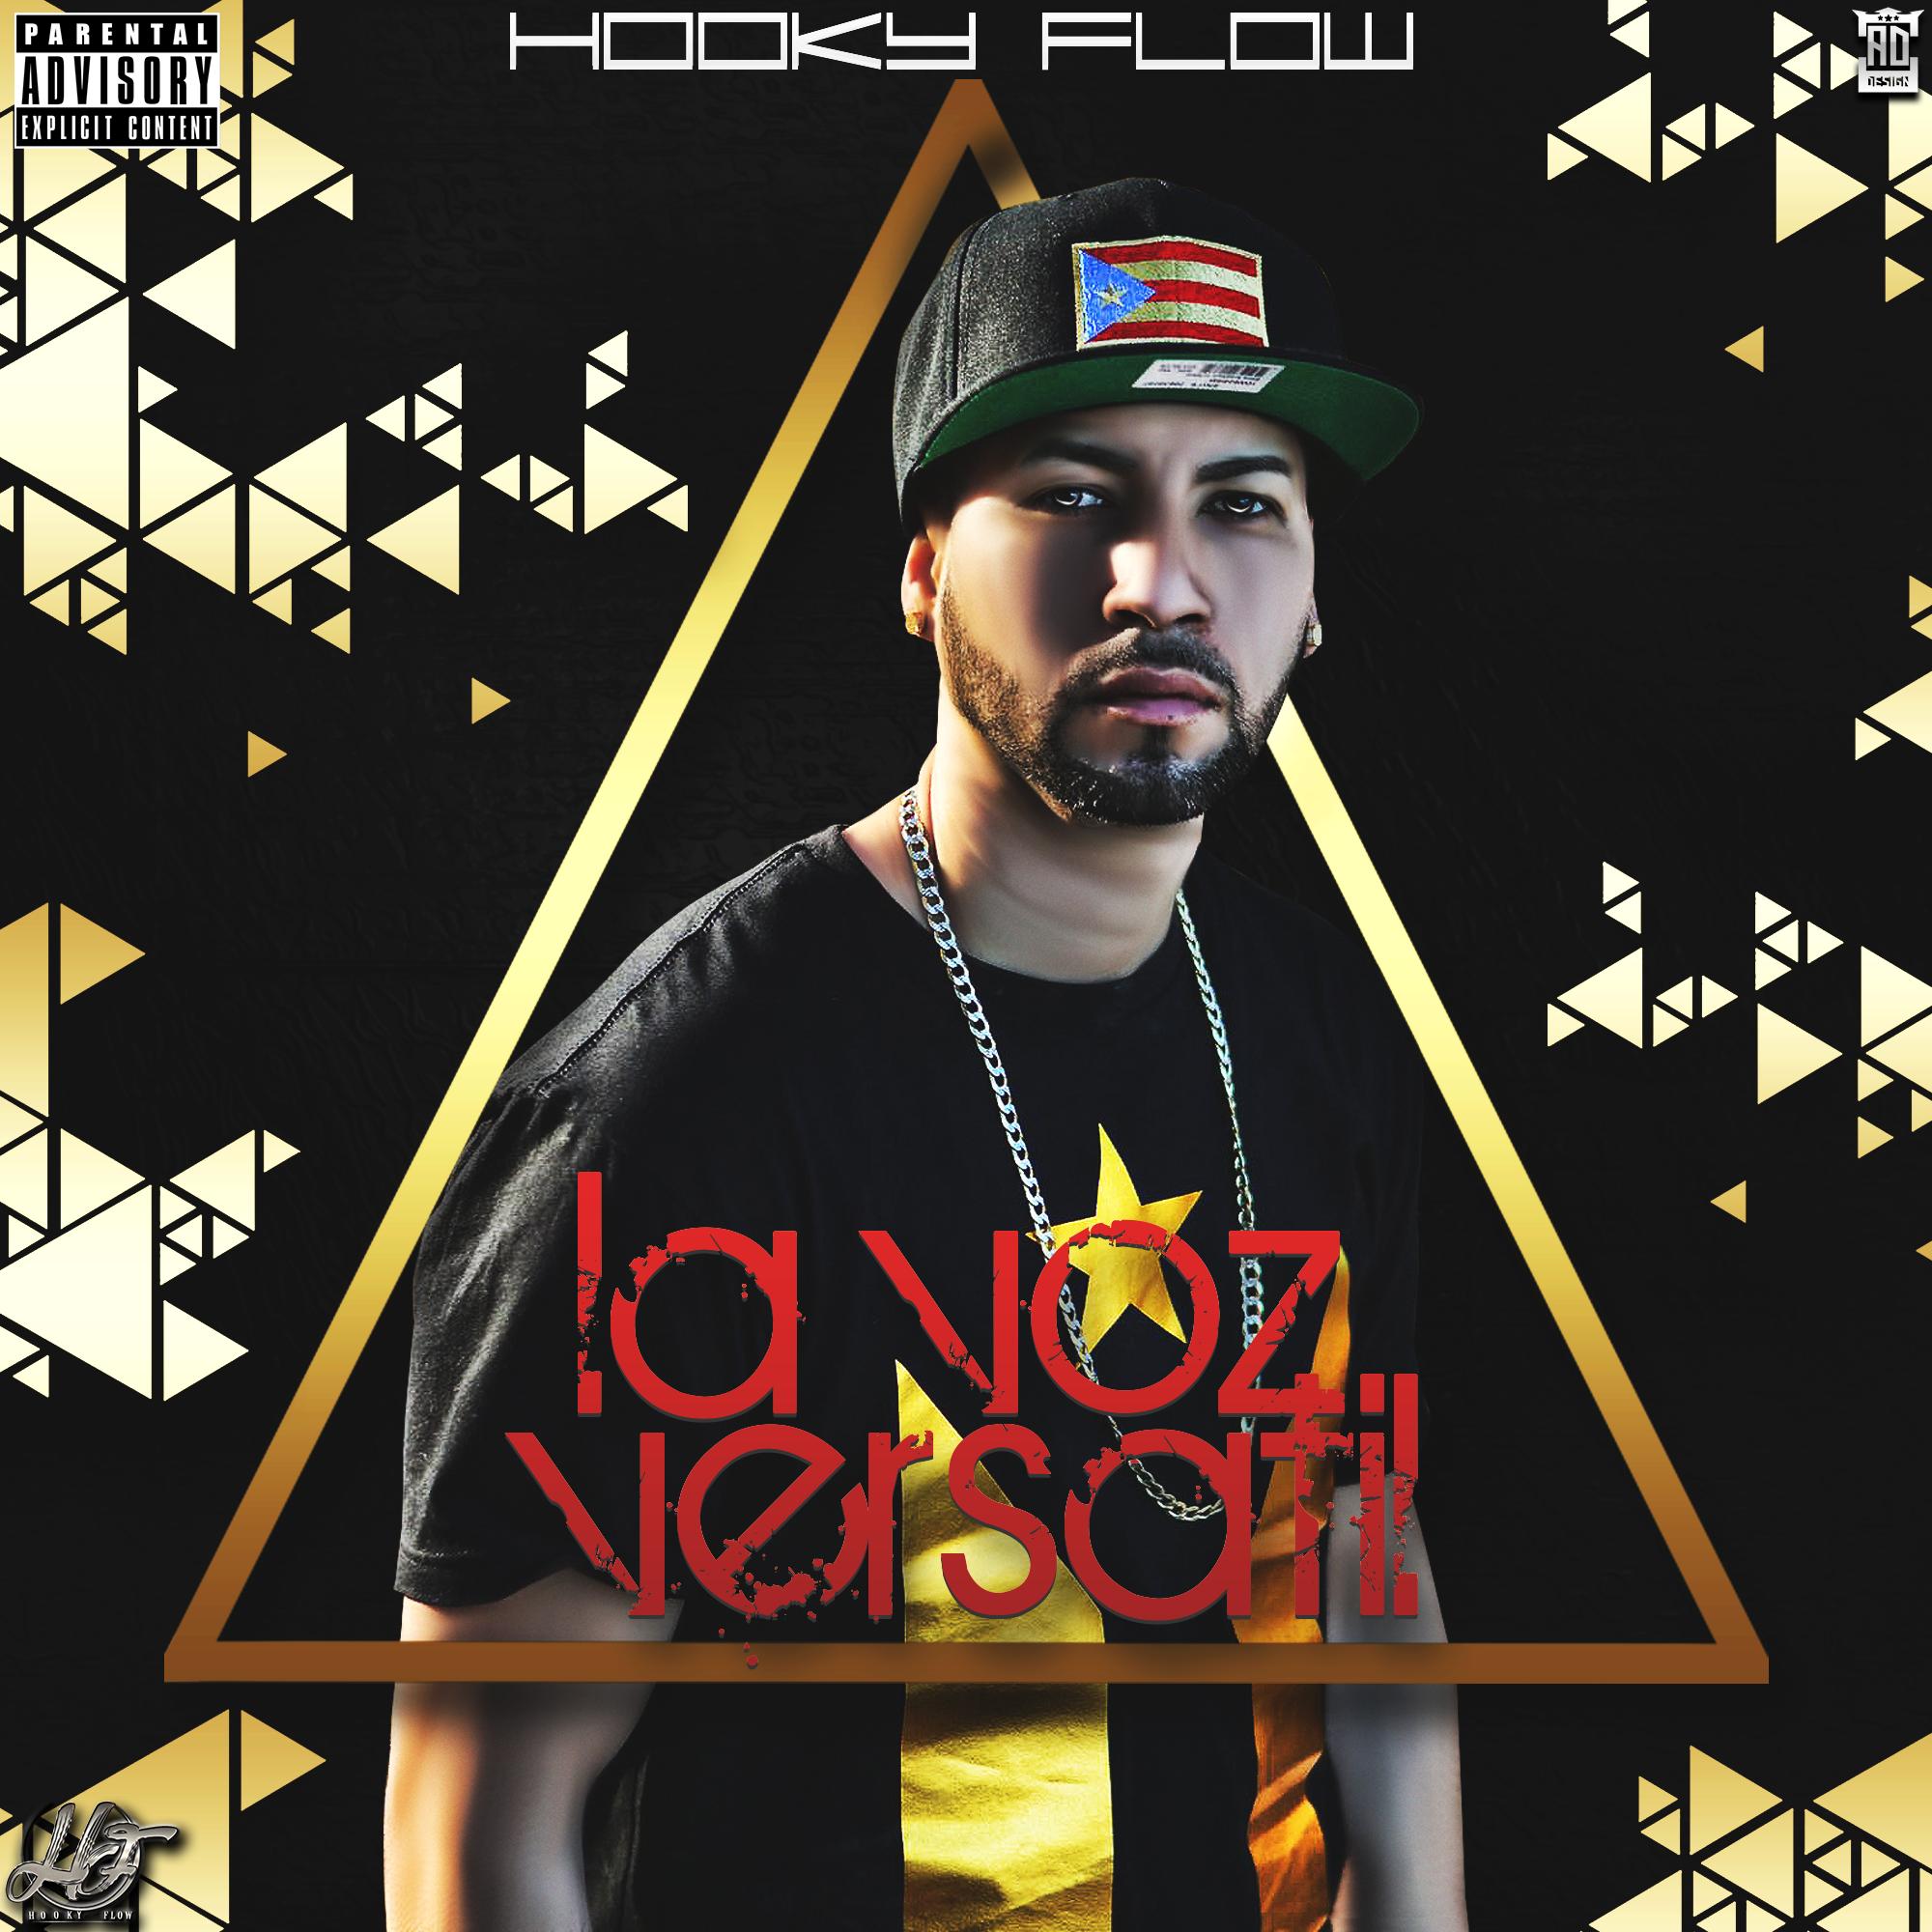 la voz versatil portada2 - Hooky Flow – La Voz Versatil